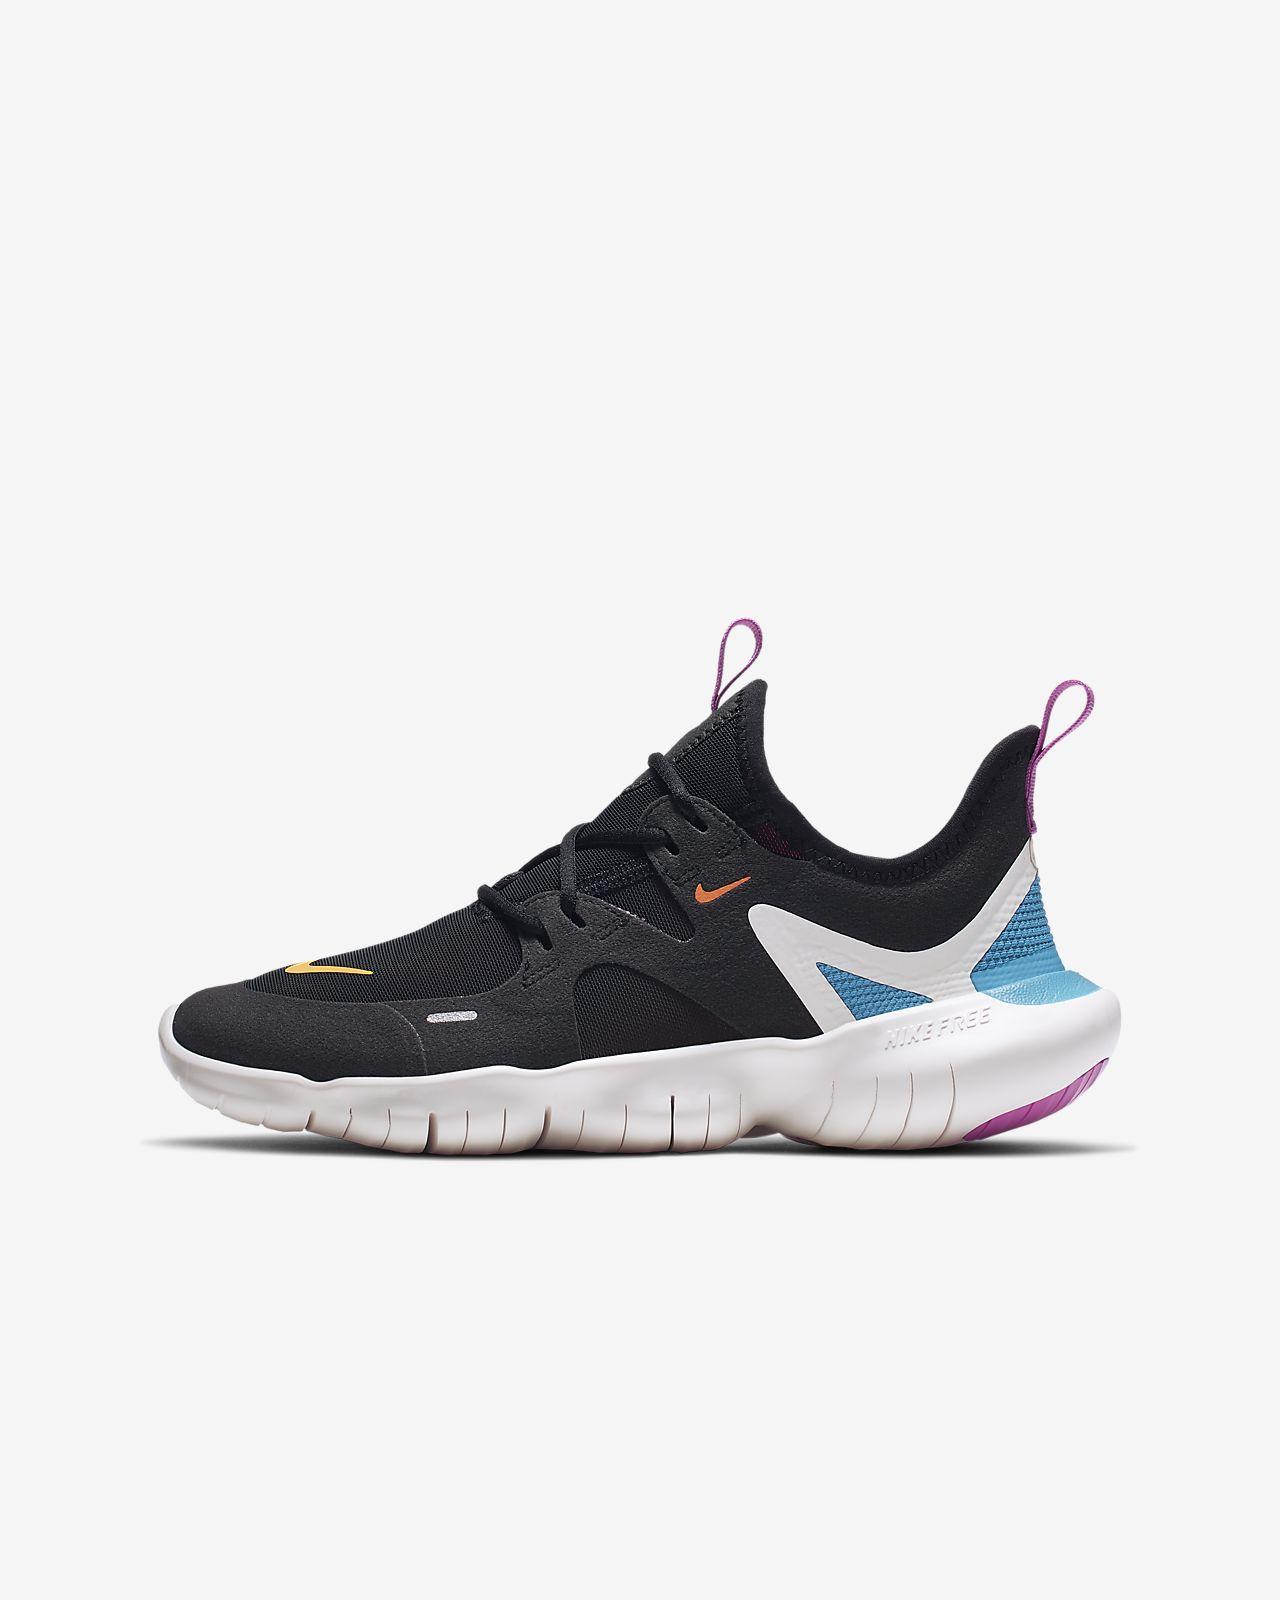 reputable site 8a14e 3ff7e Nike Free RN 5.0 Big Kids' Running Shoe